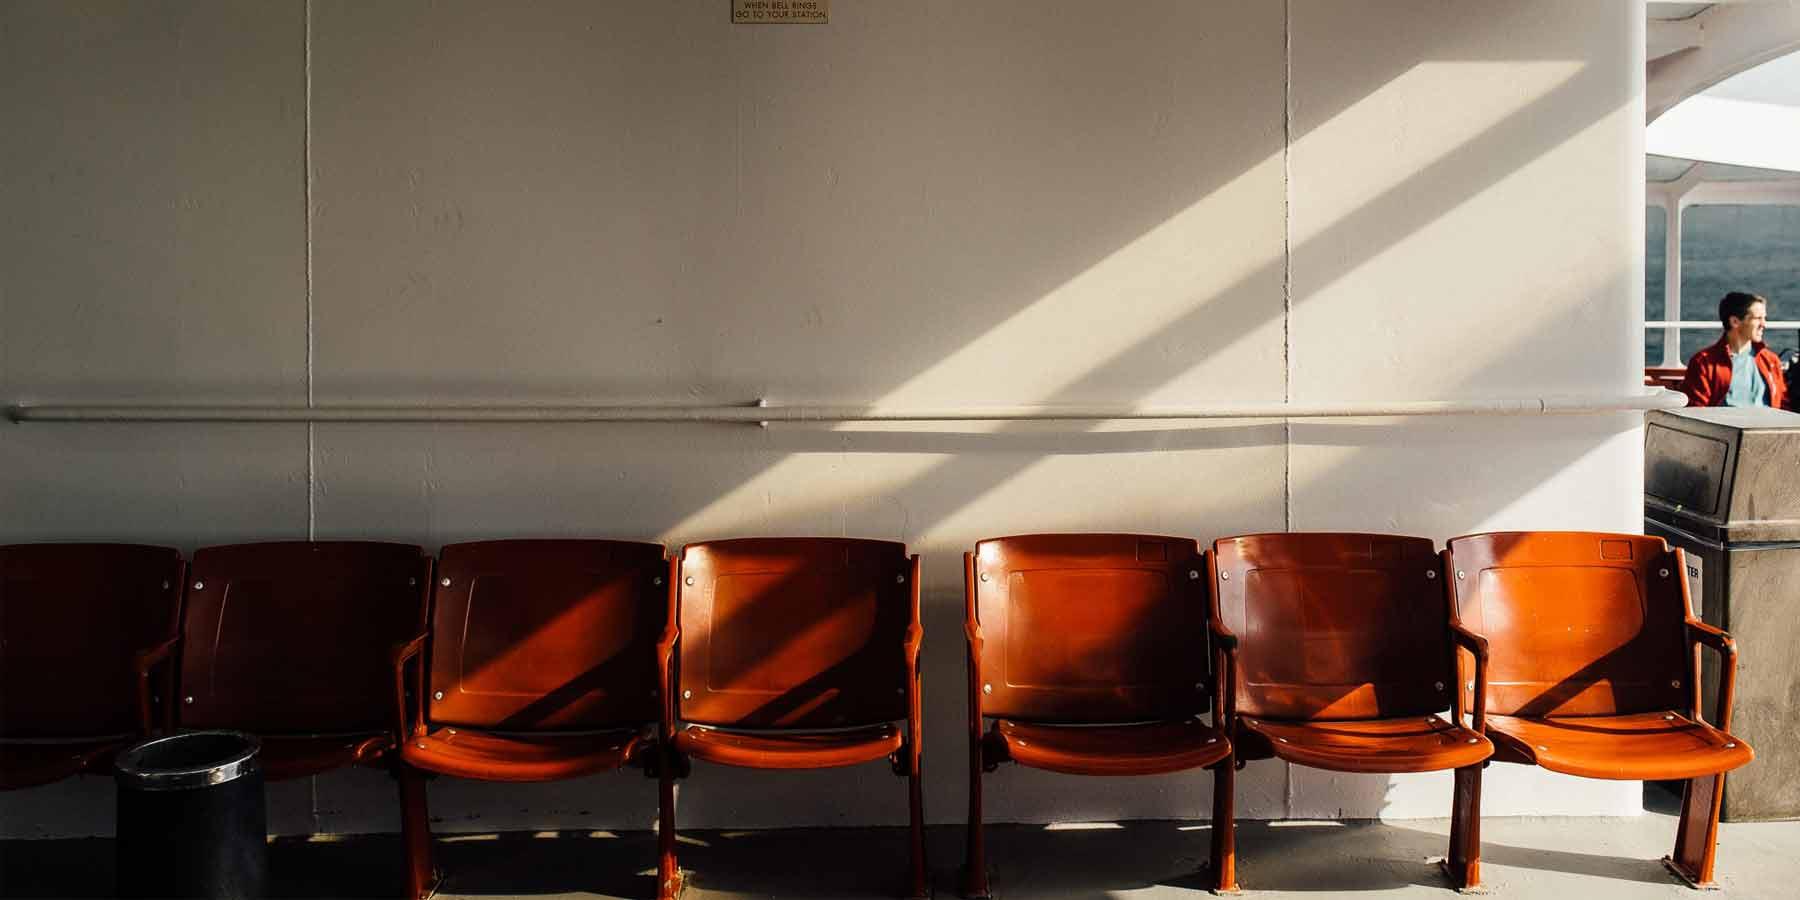 sala de espera inadecuada